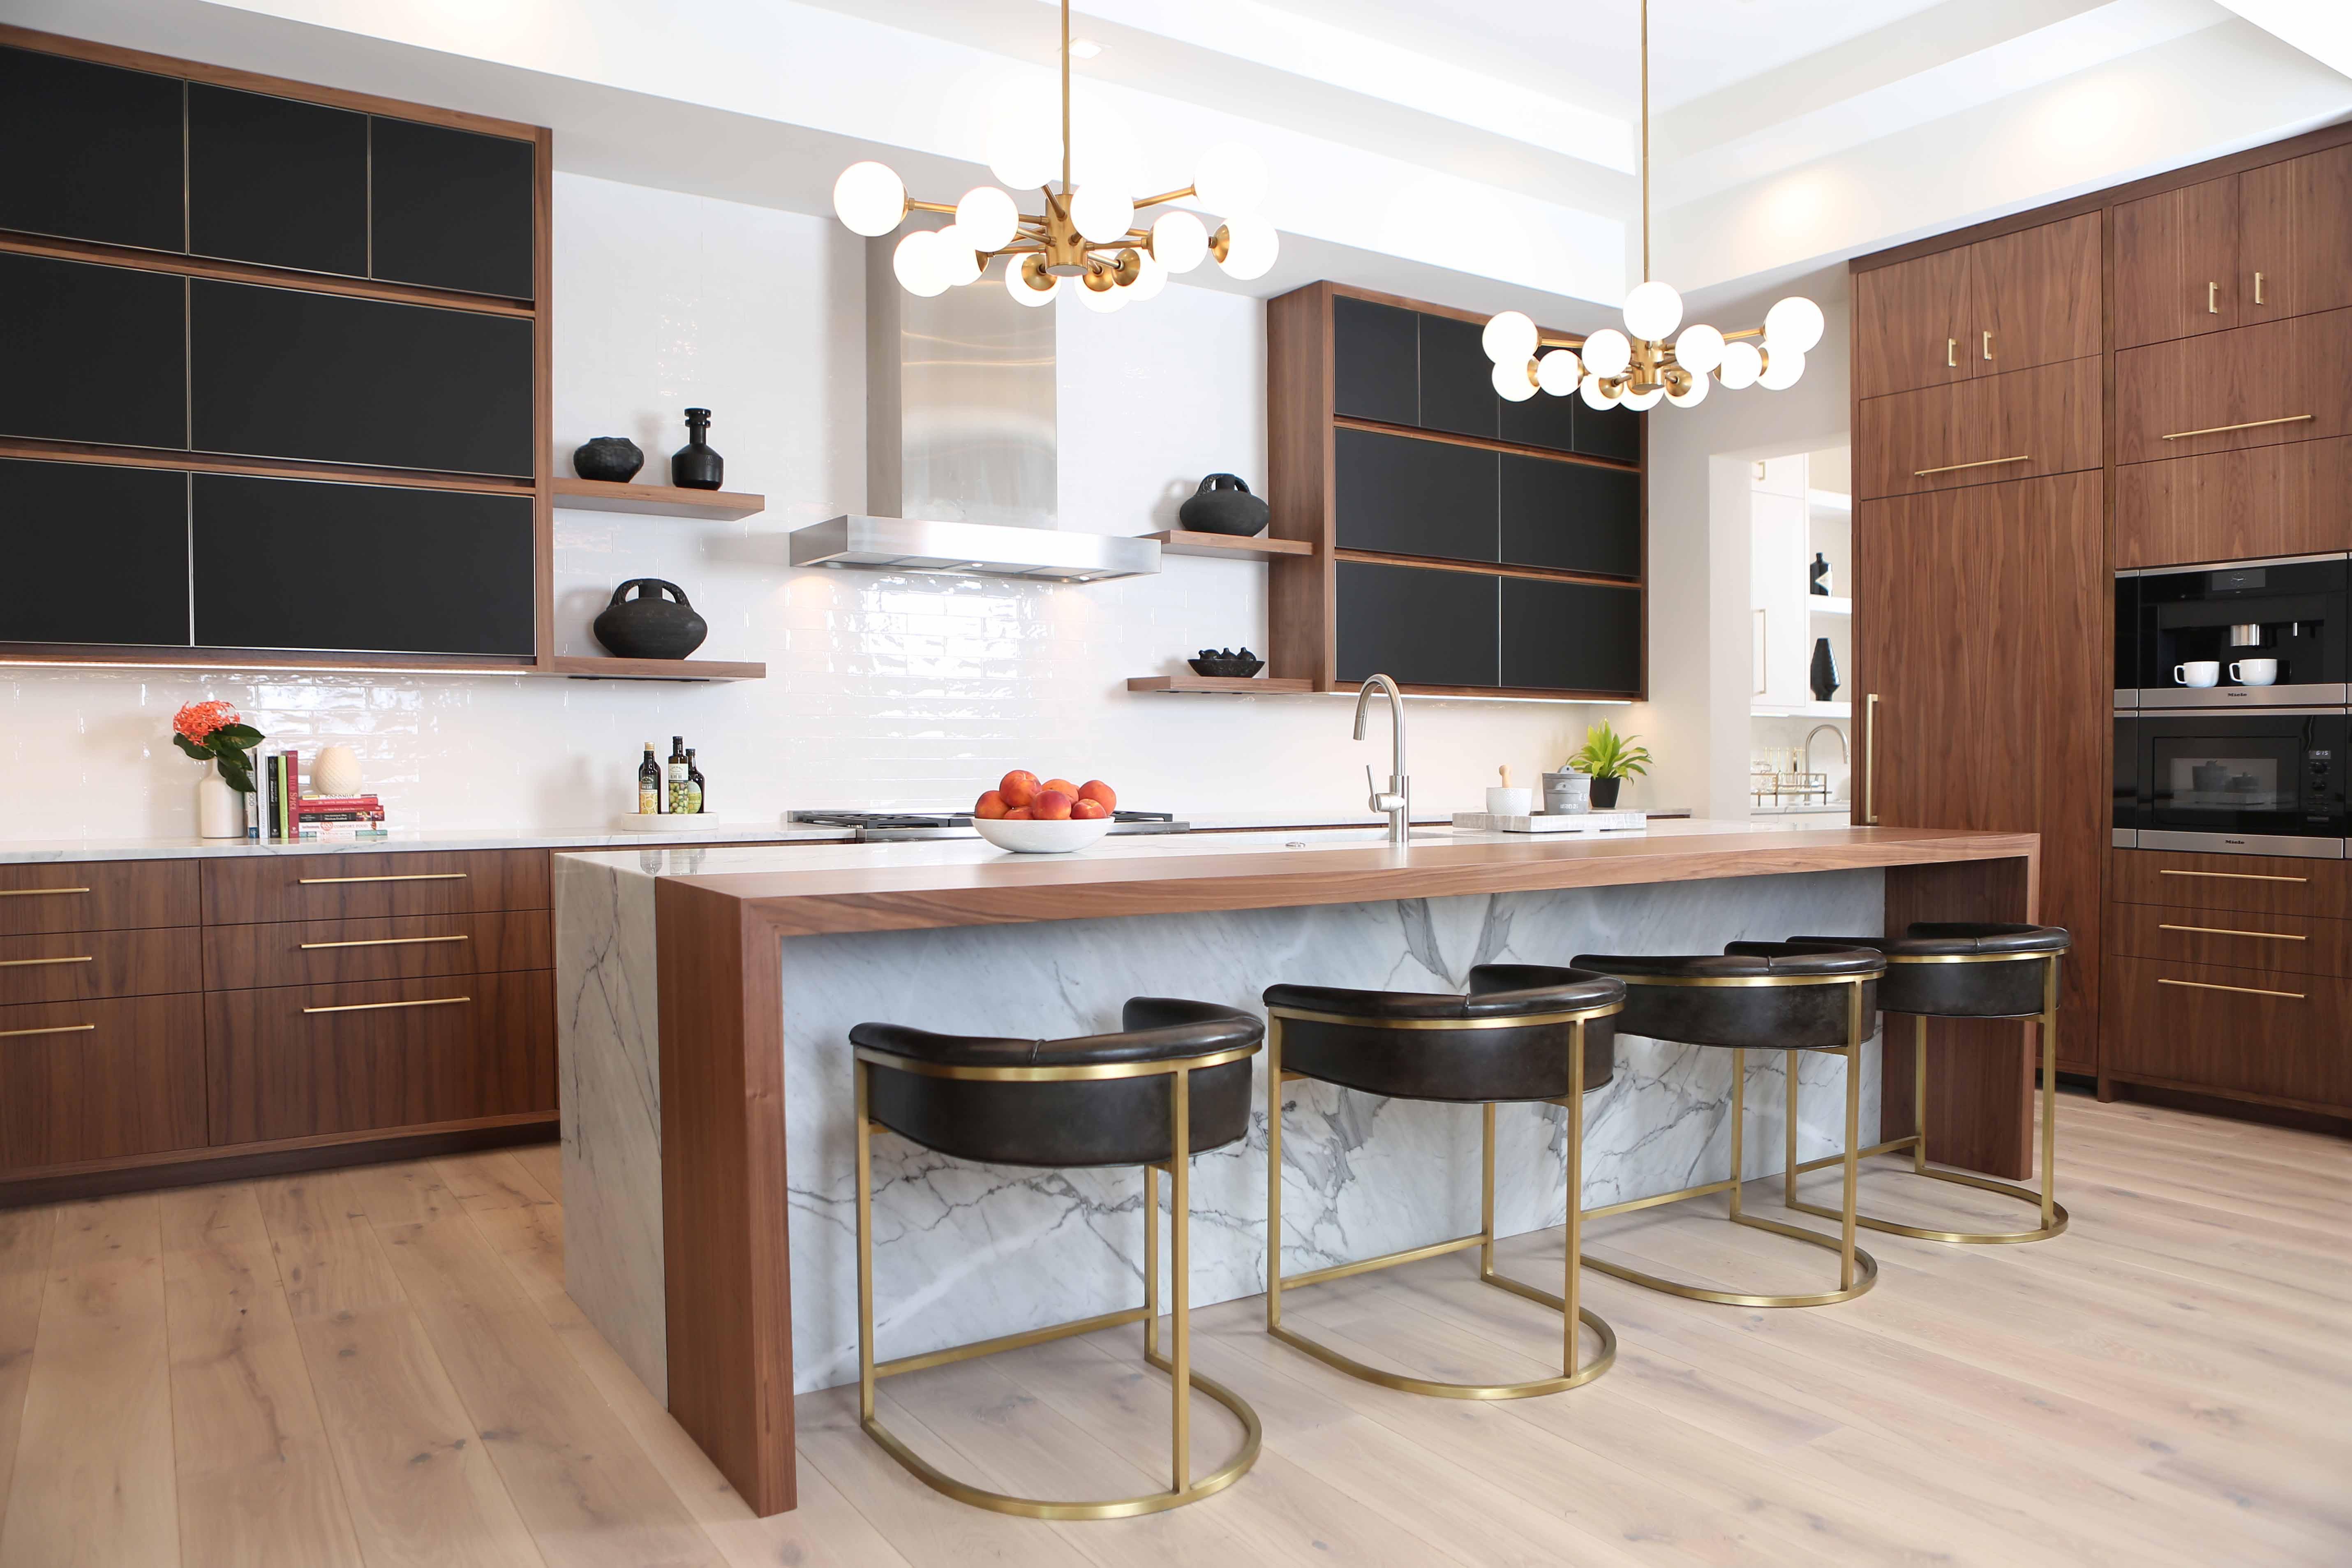 Jeffrey Fisher Home Luxury Interior Design Imagined Home Decor Custom Kitchen Design